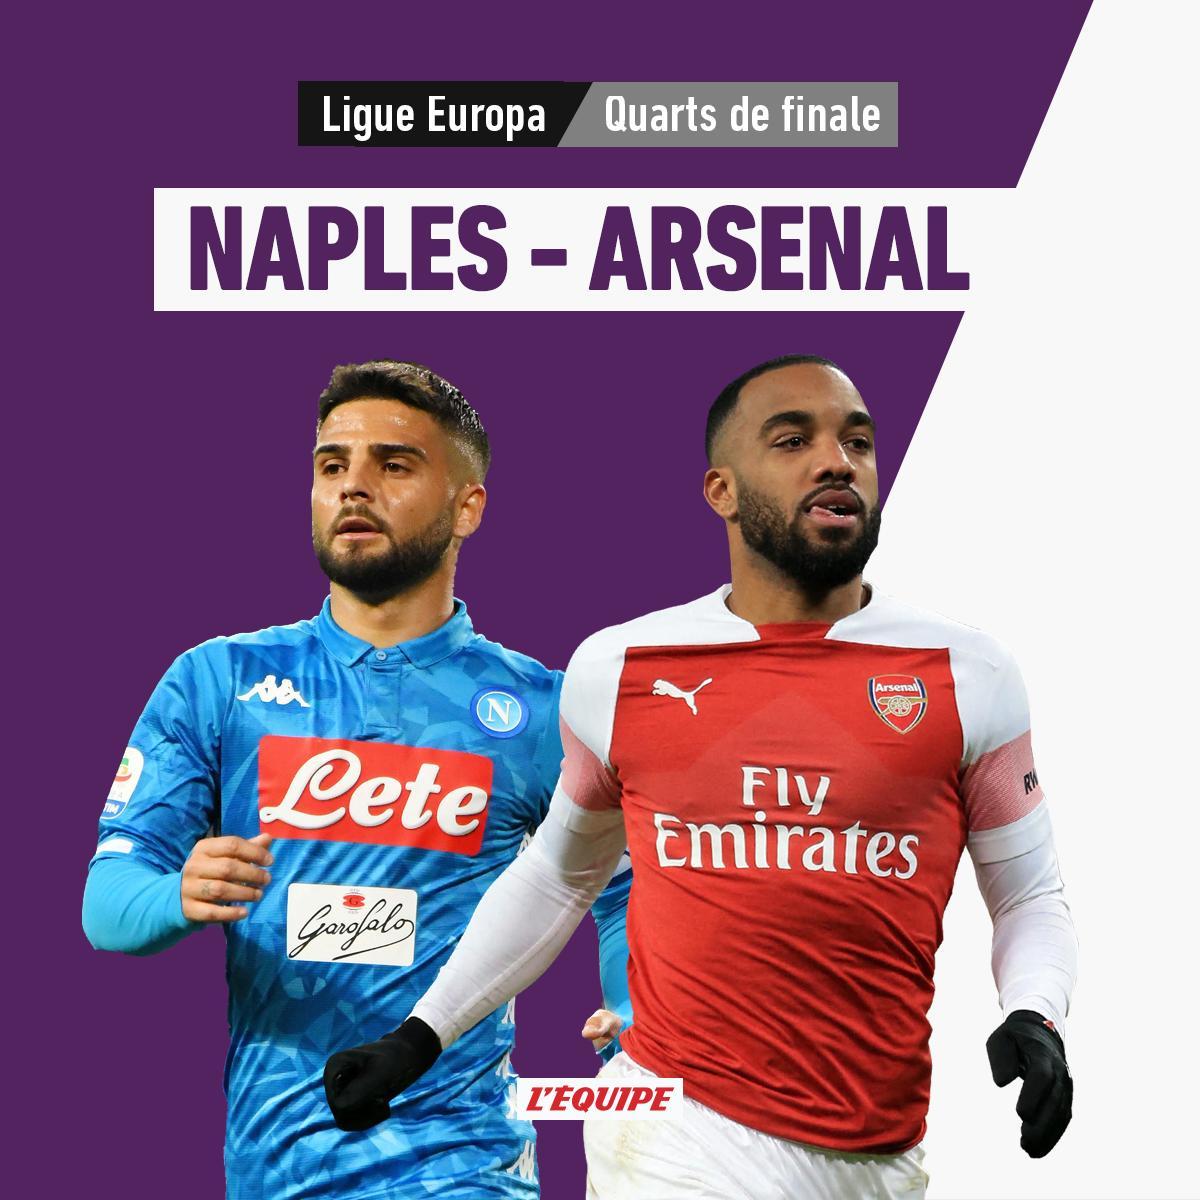 L'├ЅQUIPE's photo on Arsenal - Naples